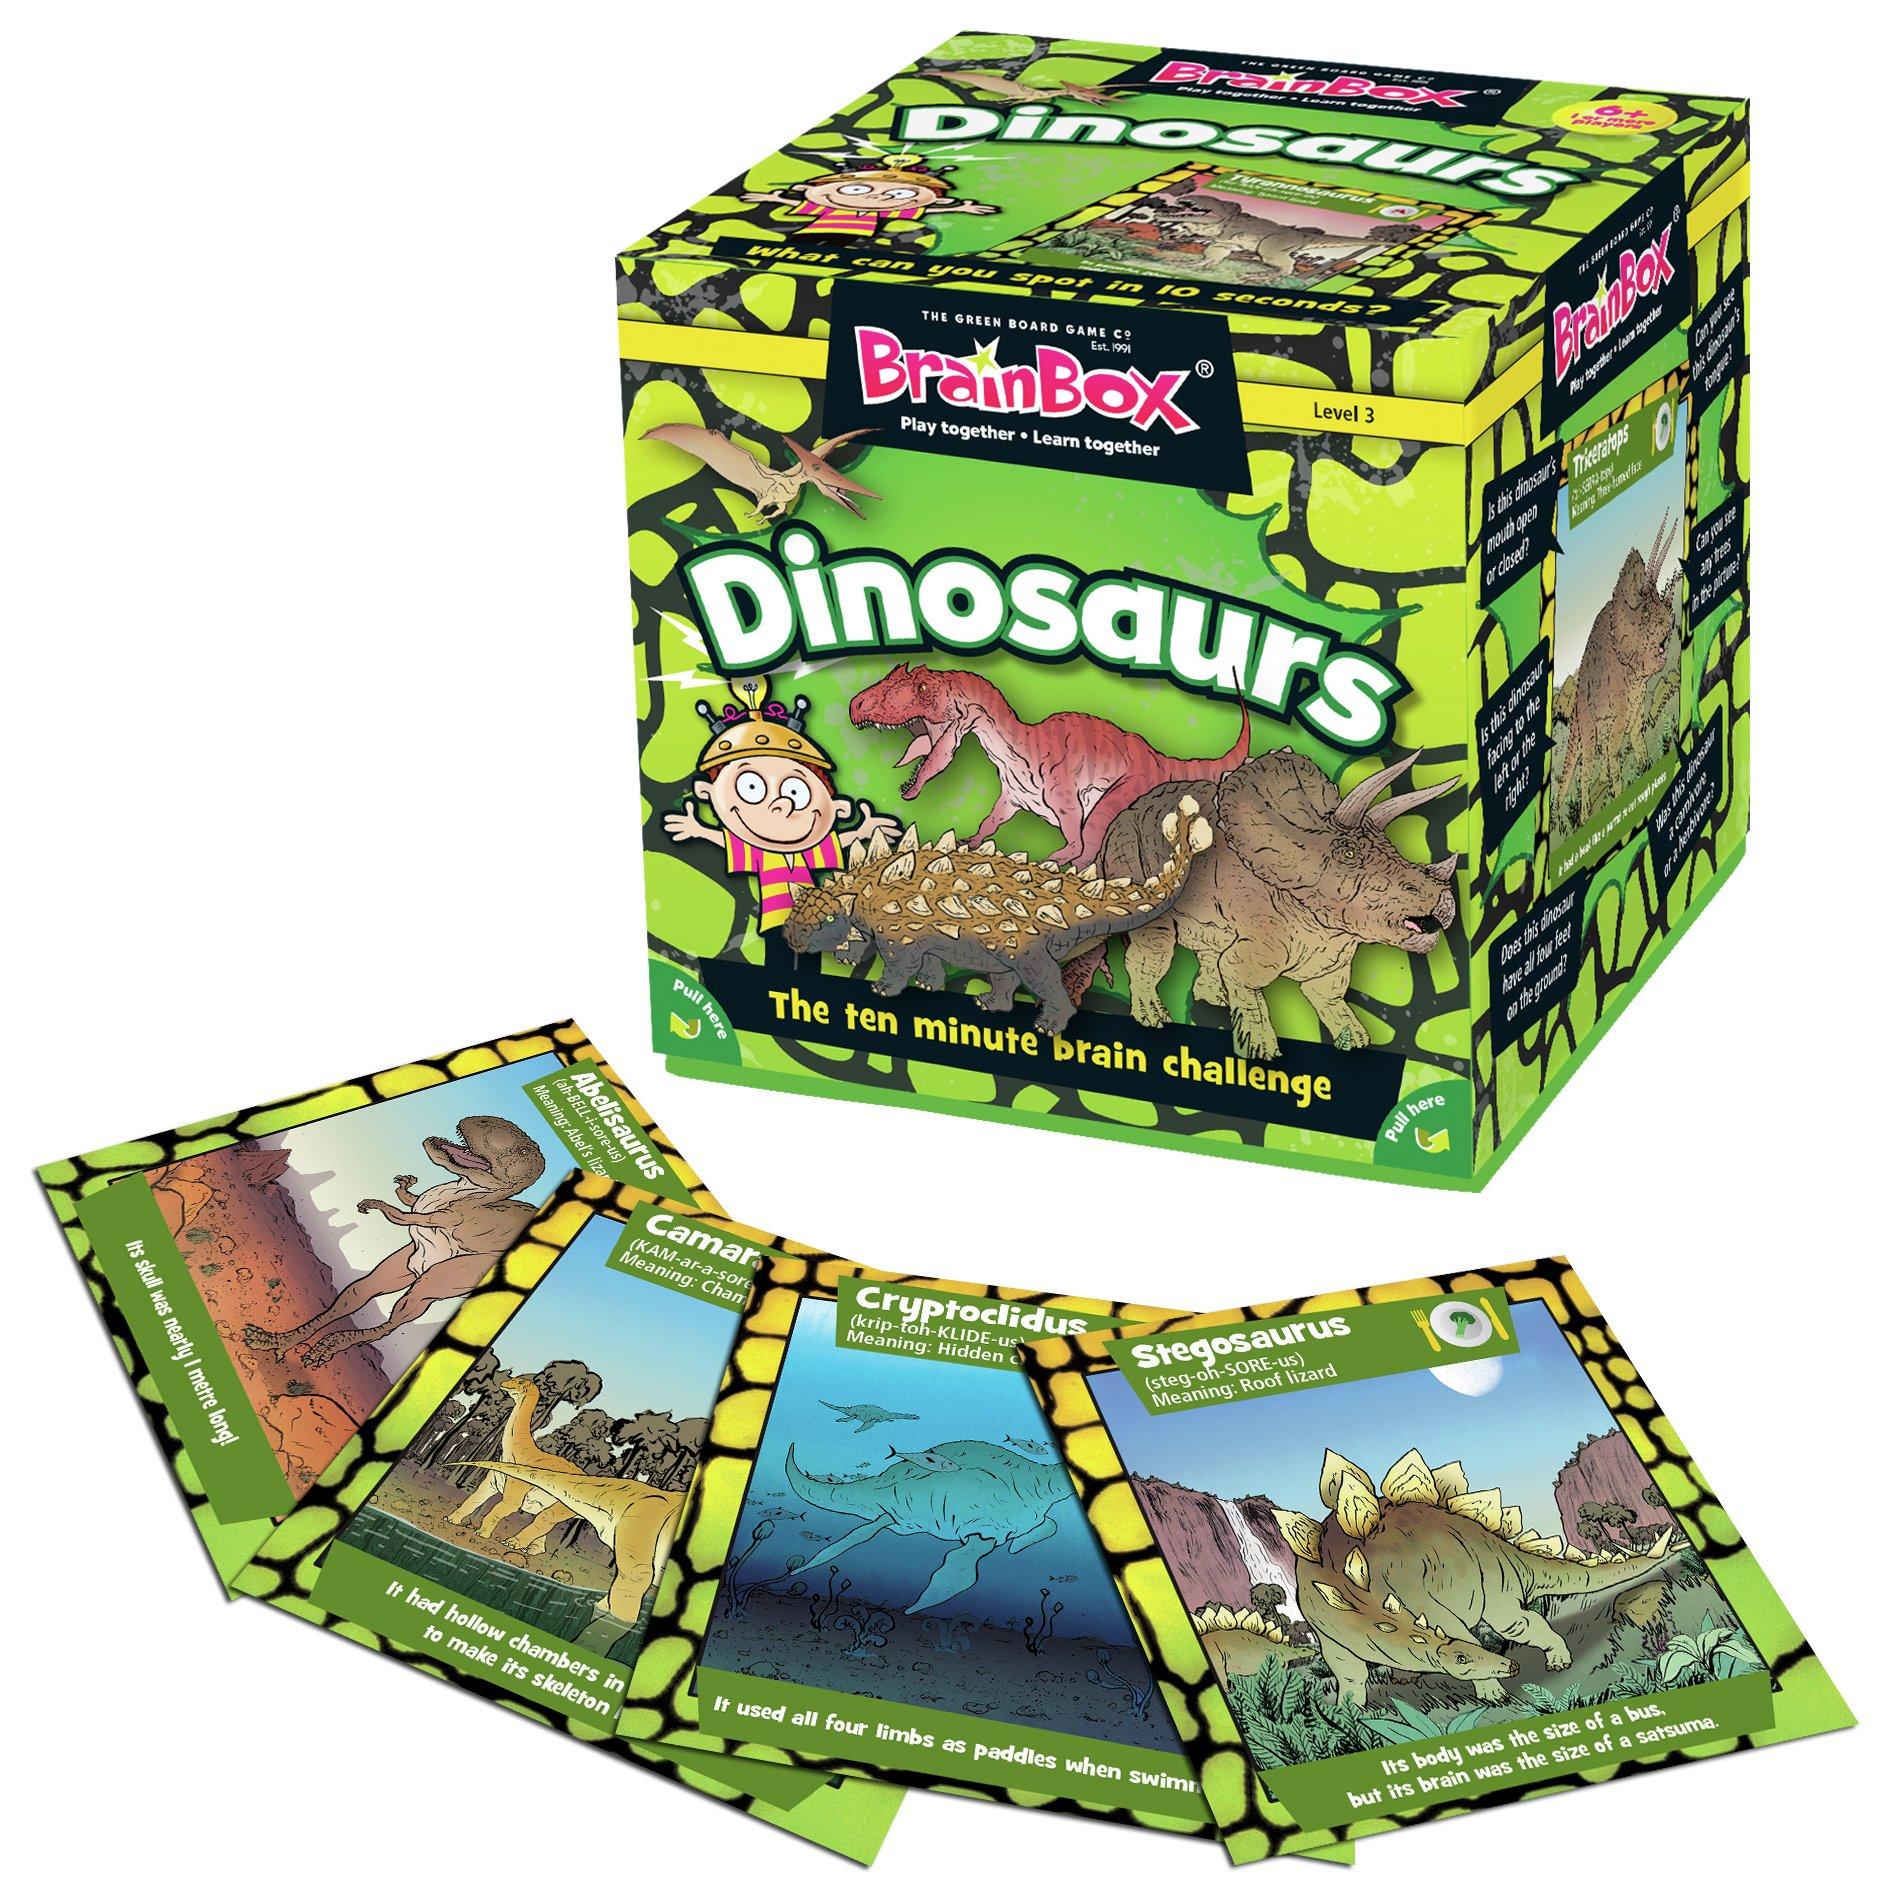 Image of BrainBox Dinosaurs Game.